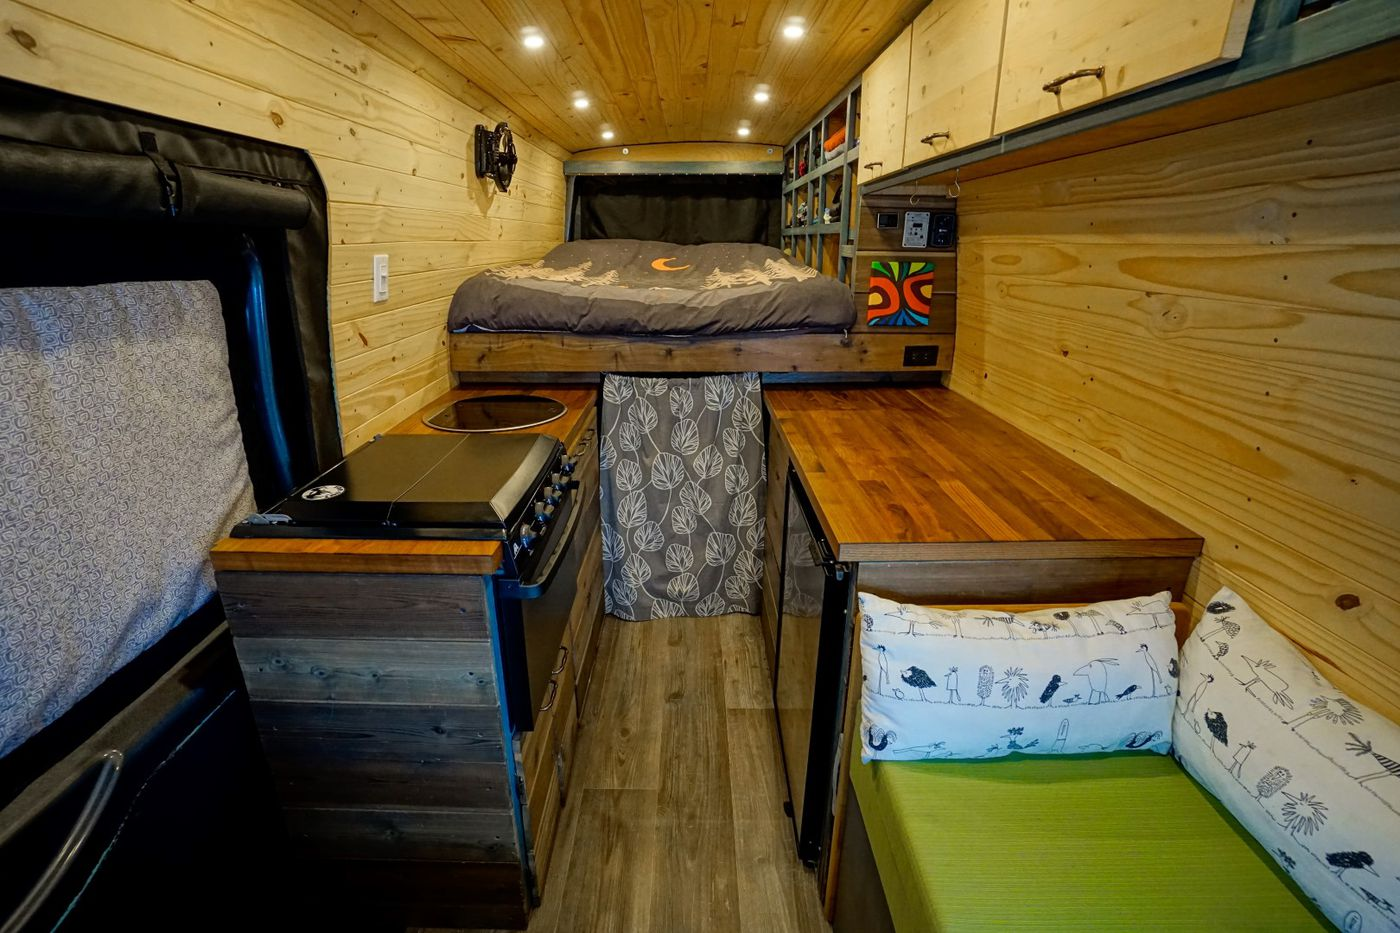 DIY camper van cost just $18K to build - Curbed